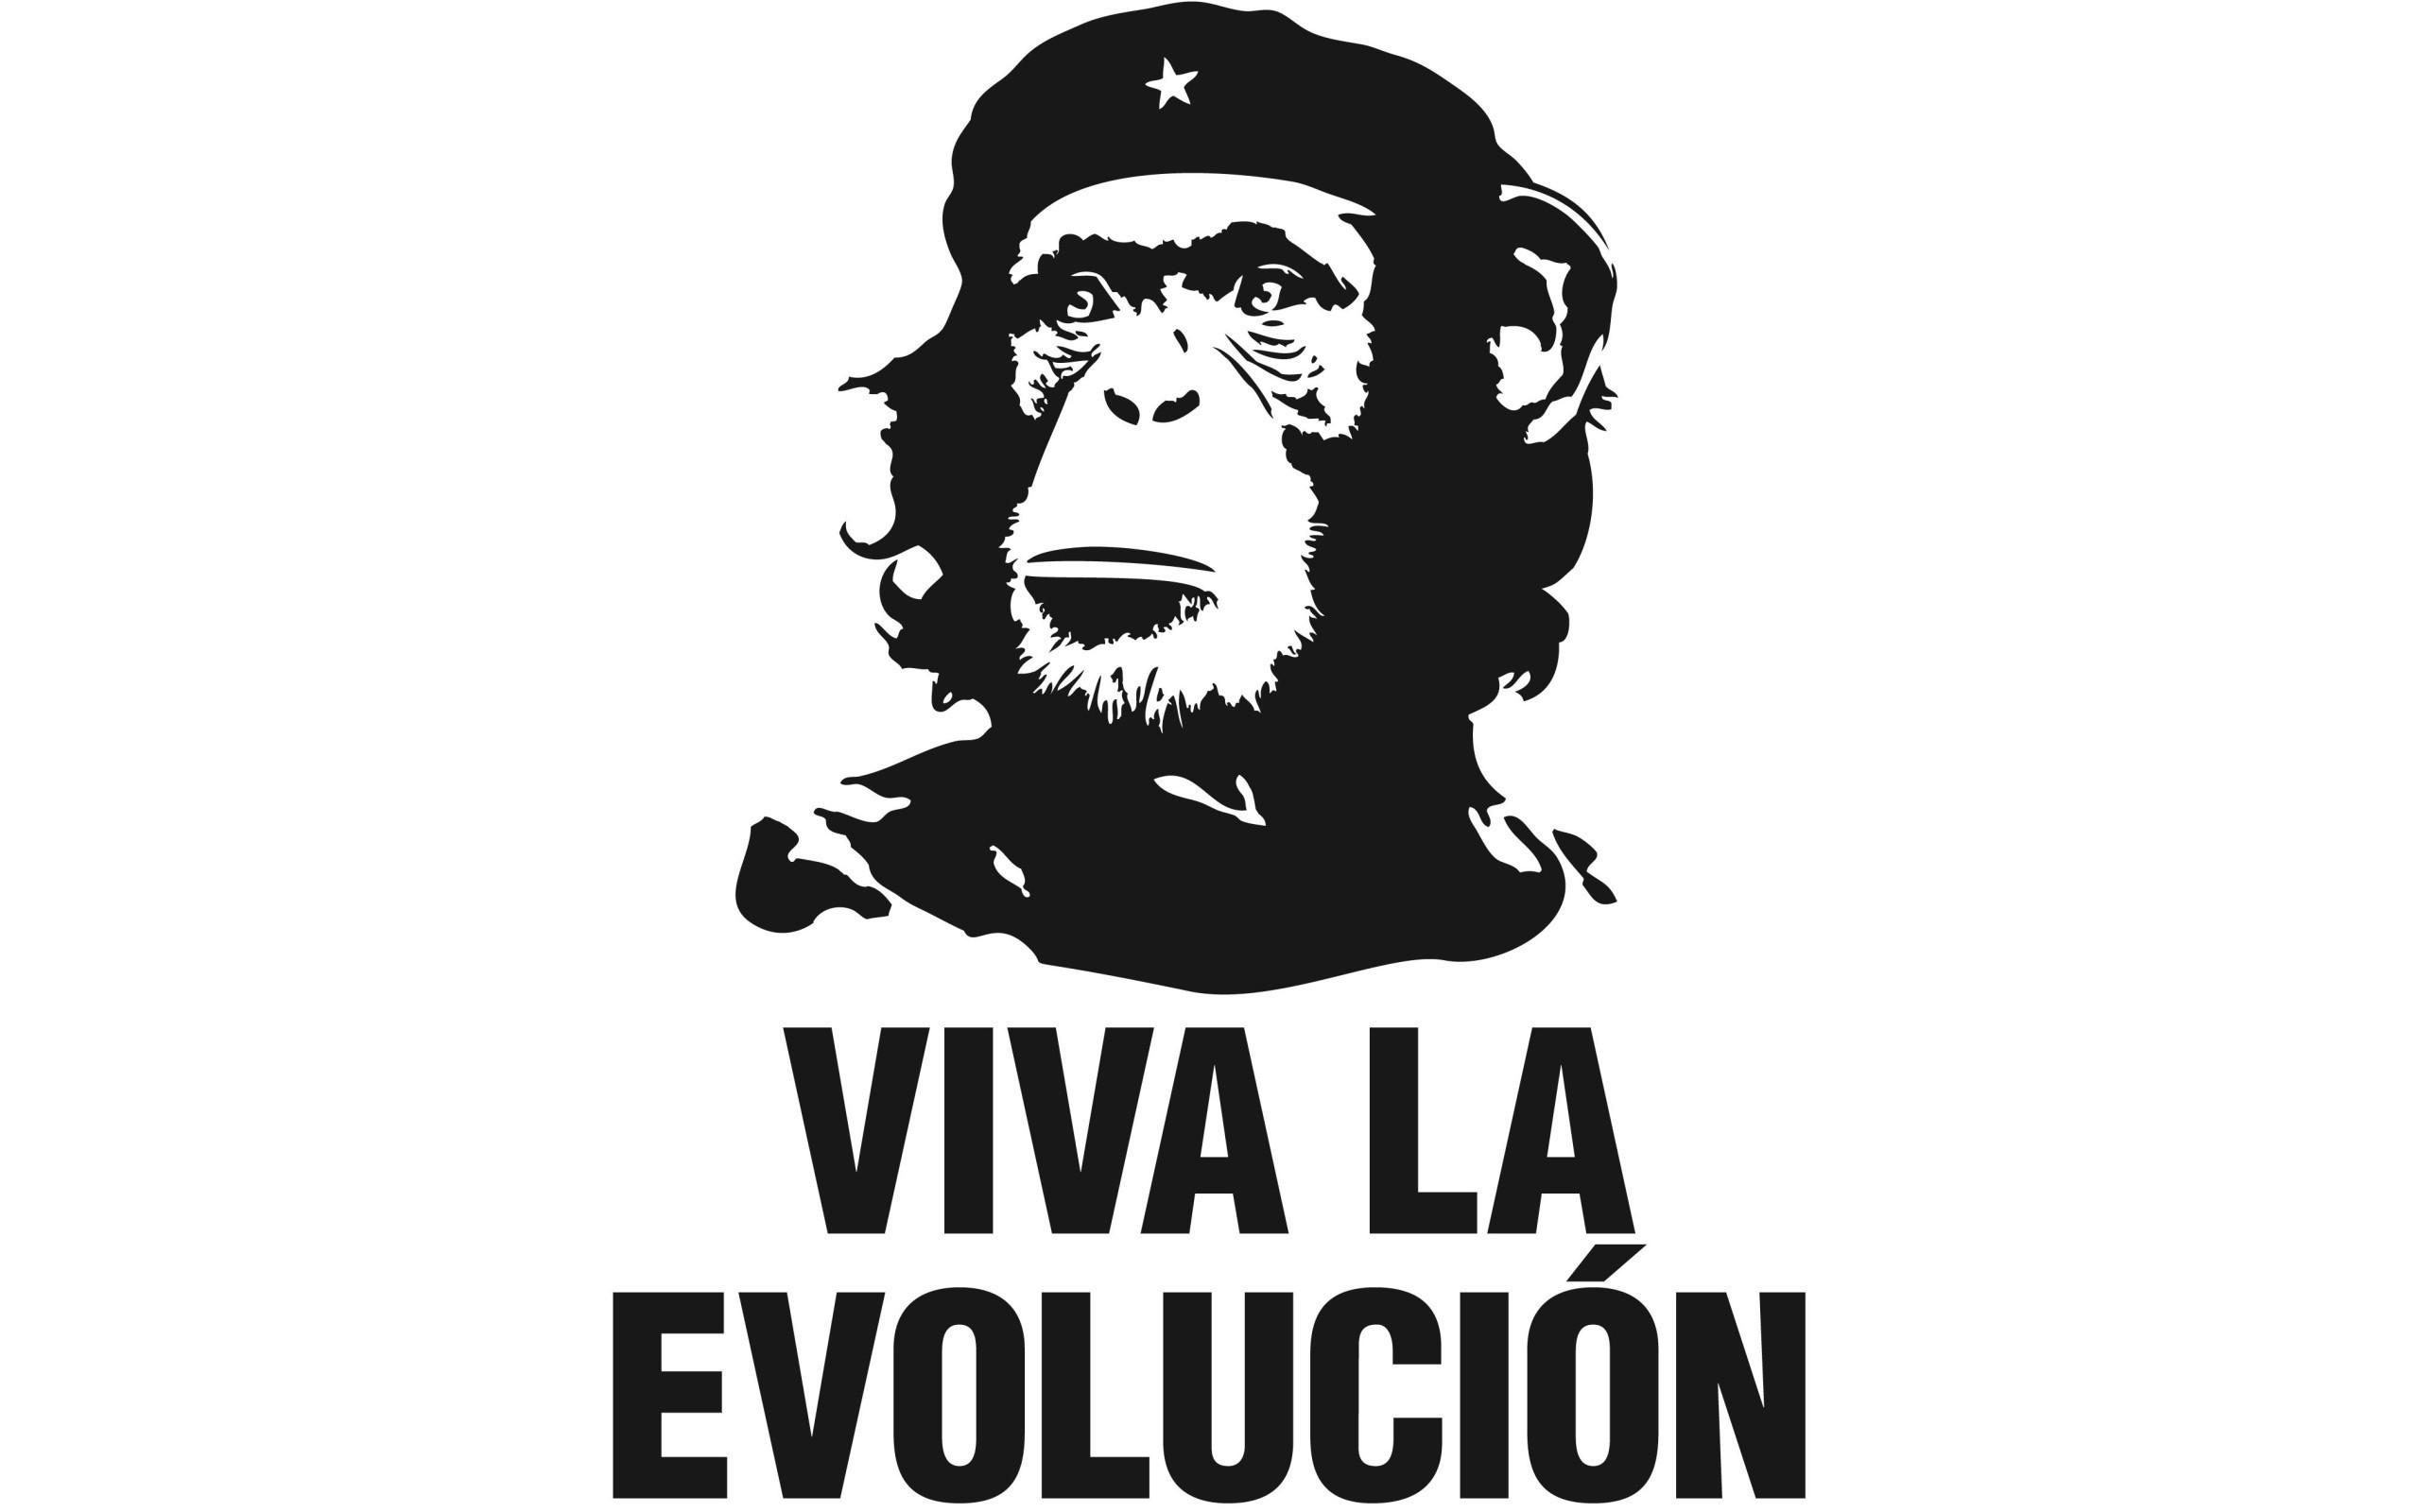 Che Troll [Paullus23] | Che Guevara | Pinterest | Che guevara, deviantART  and Social community